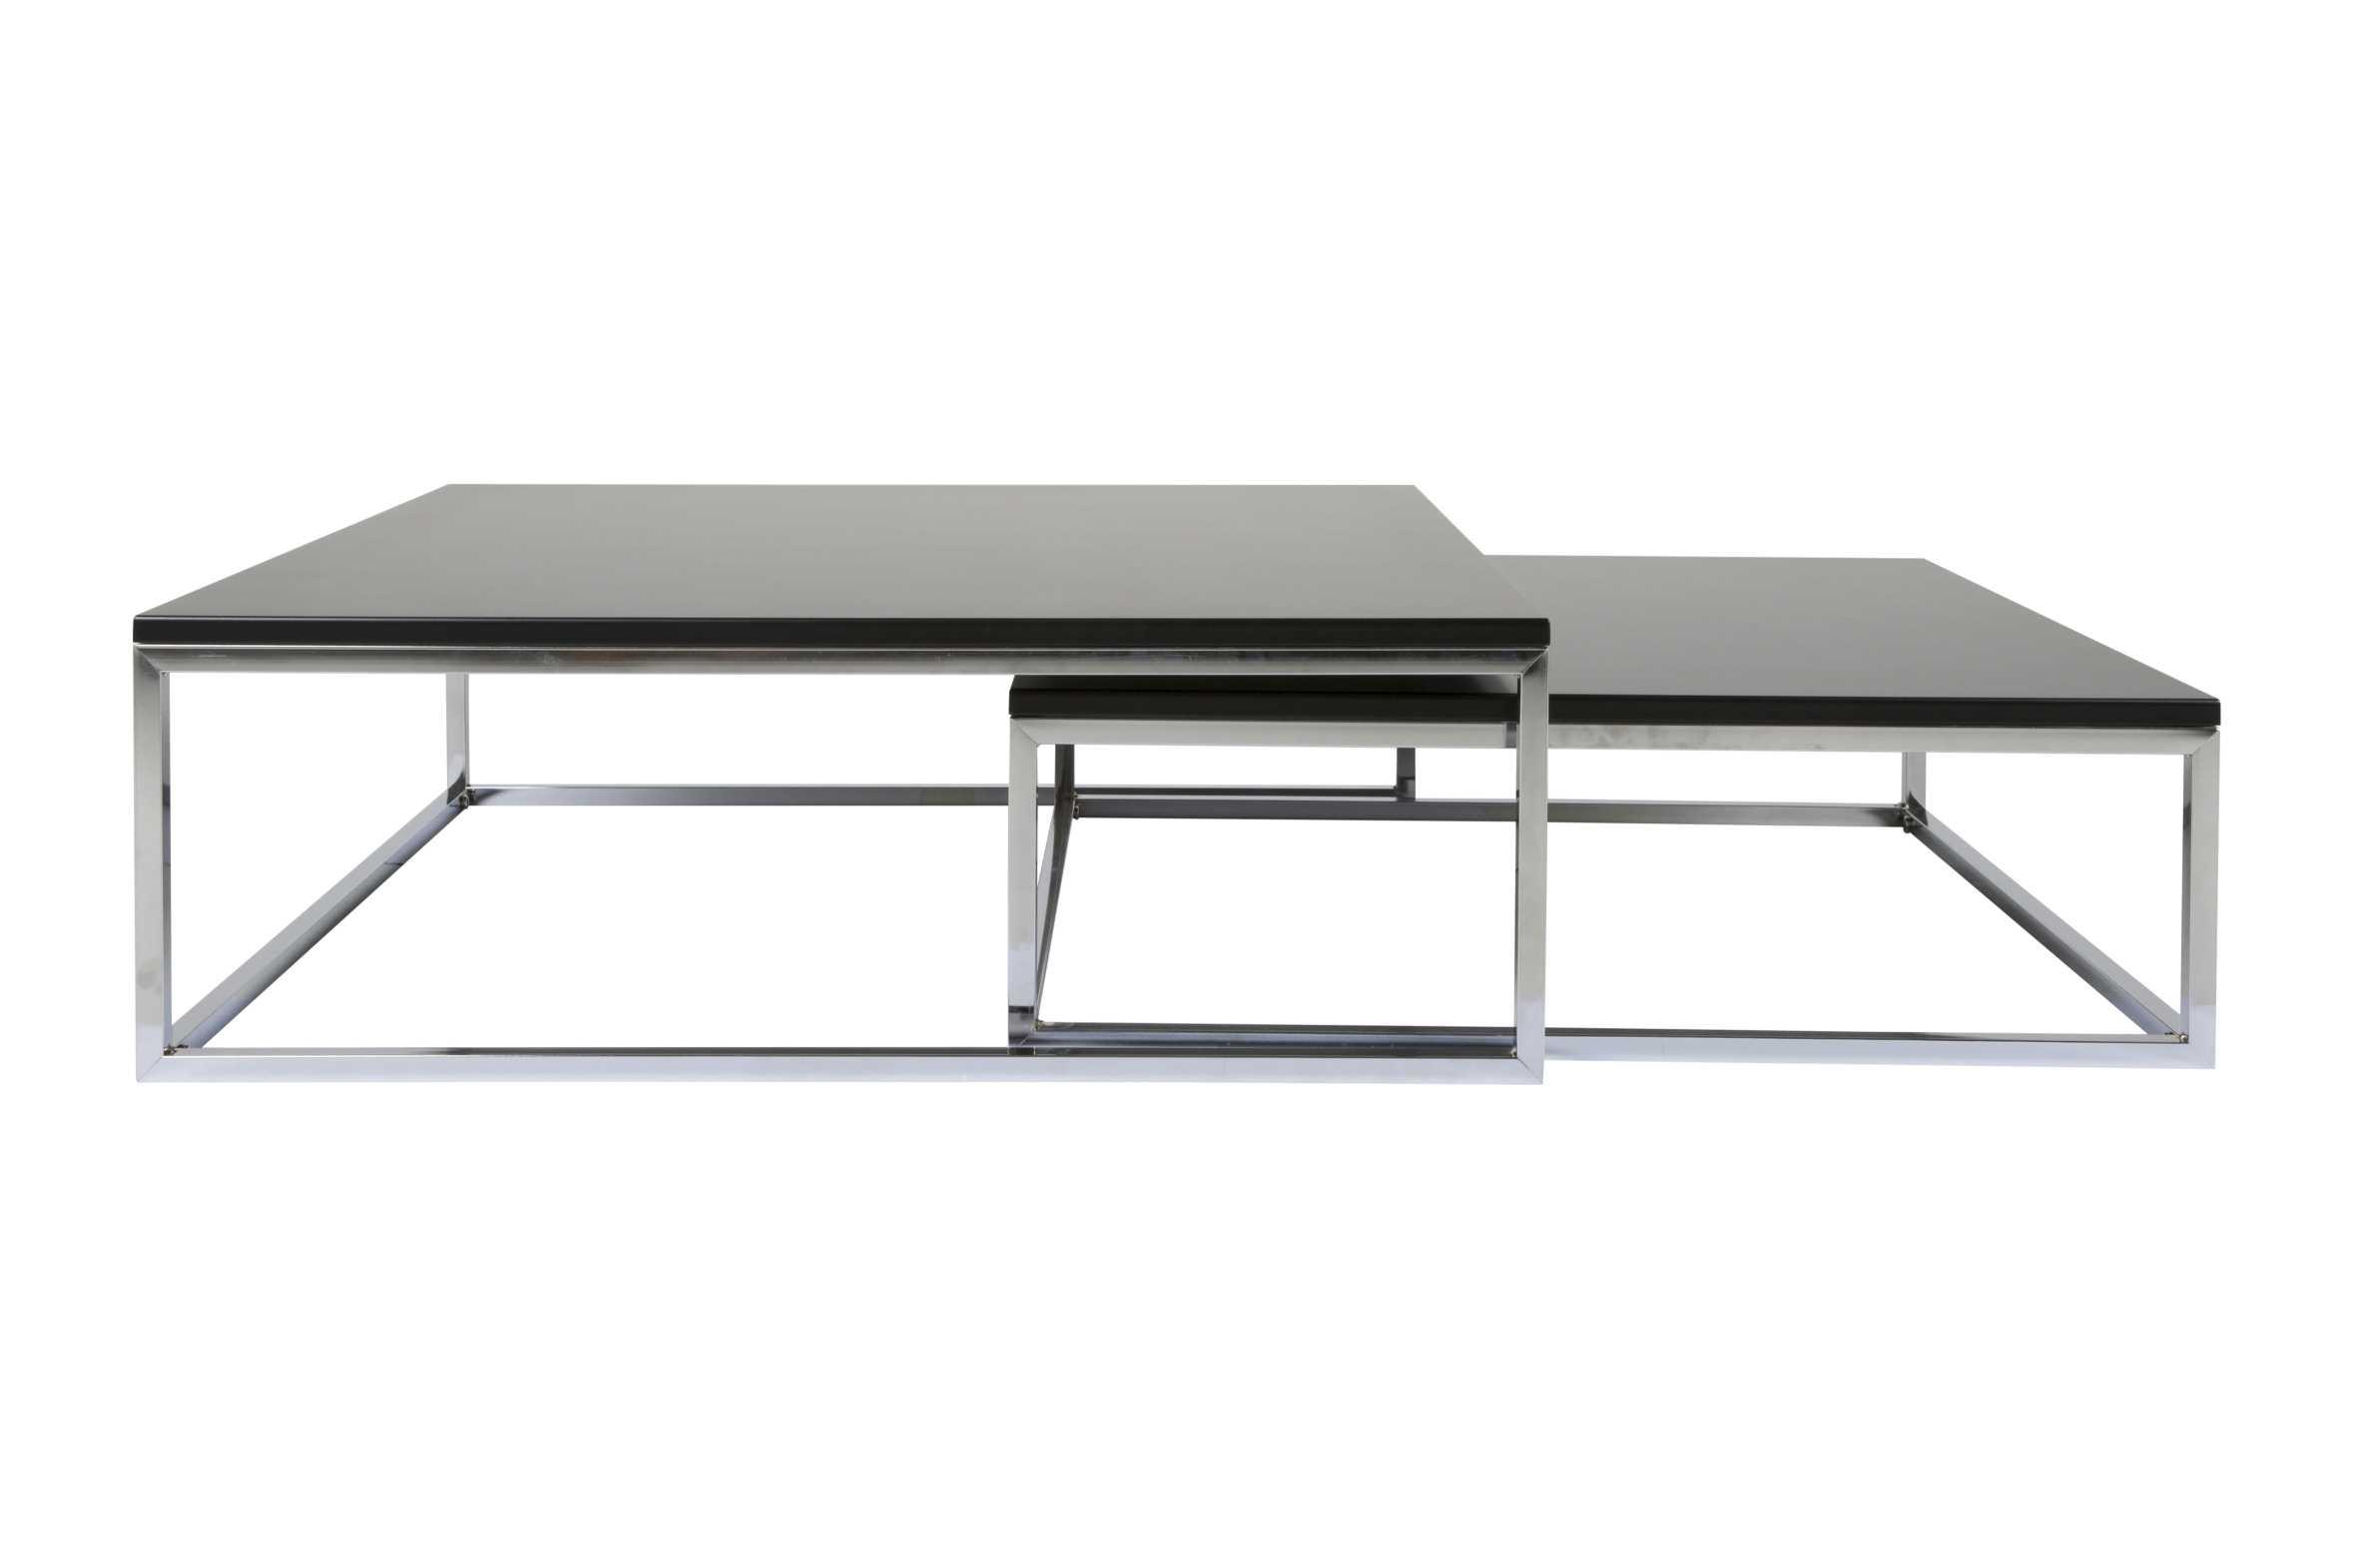 Molly sofabordssæt - sort med sølvben fra canett fra boboonline.dk